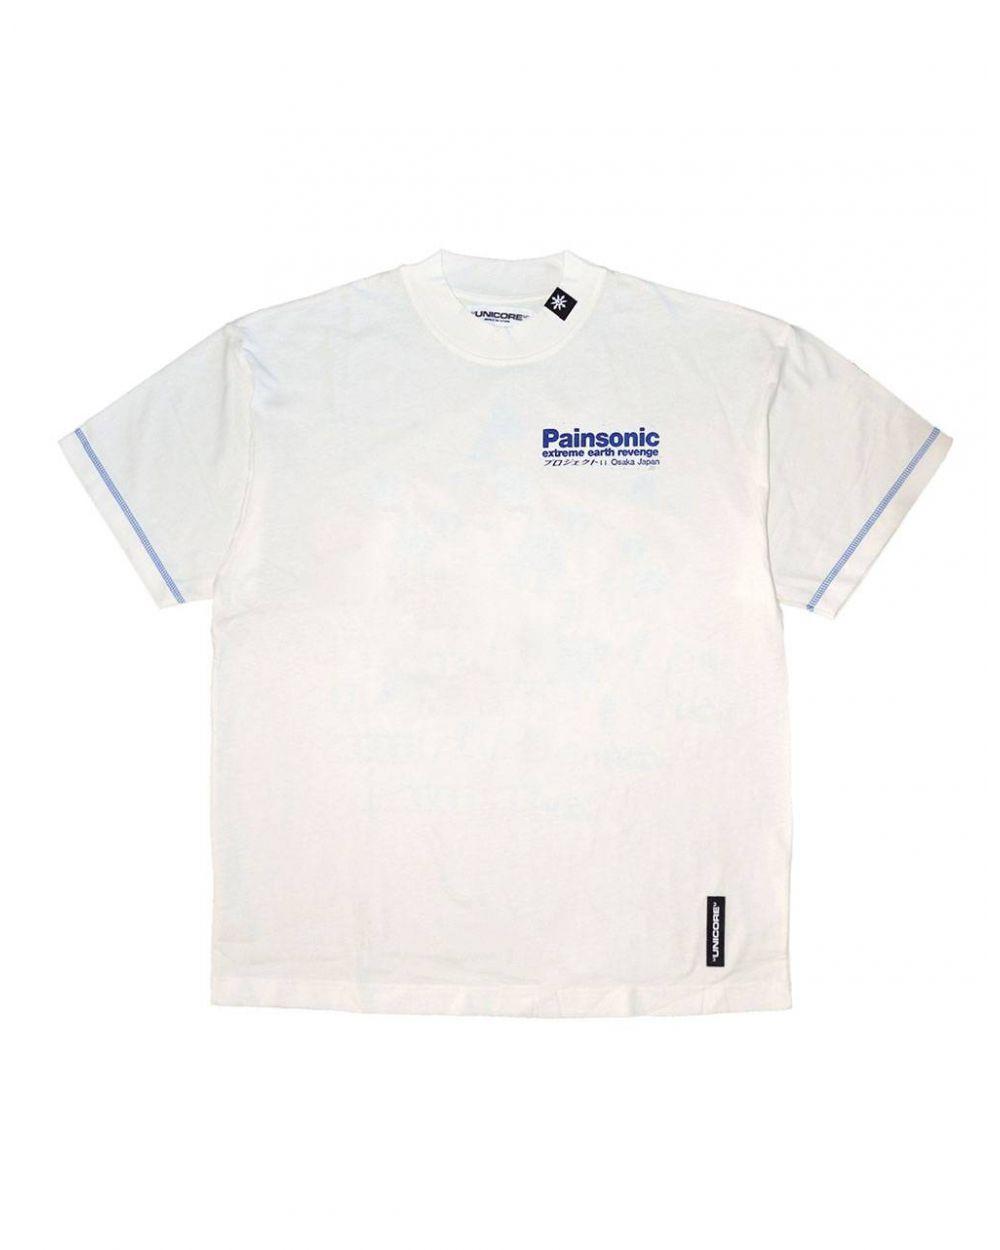 Unicore Romantic Pain tee - white Unicore T-shirt 60,00€